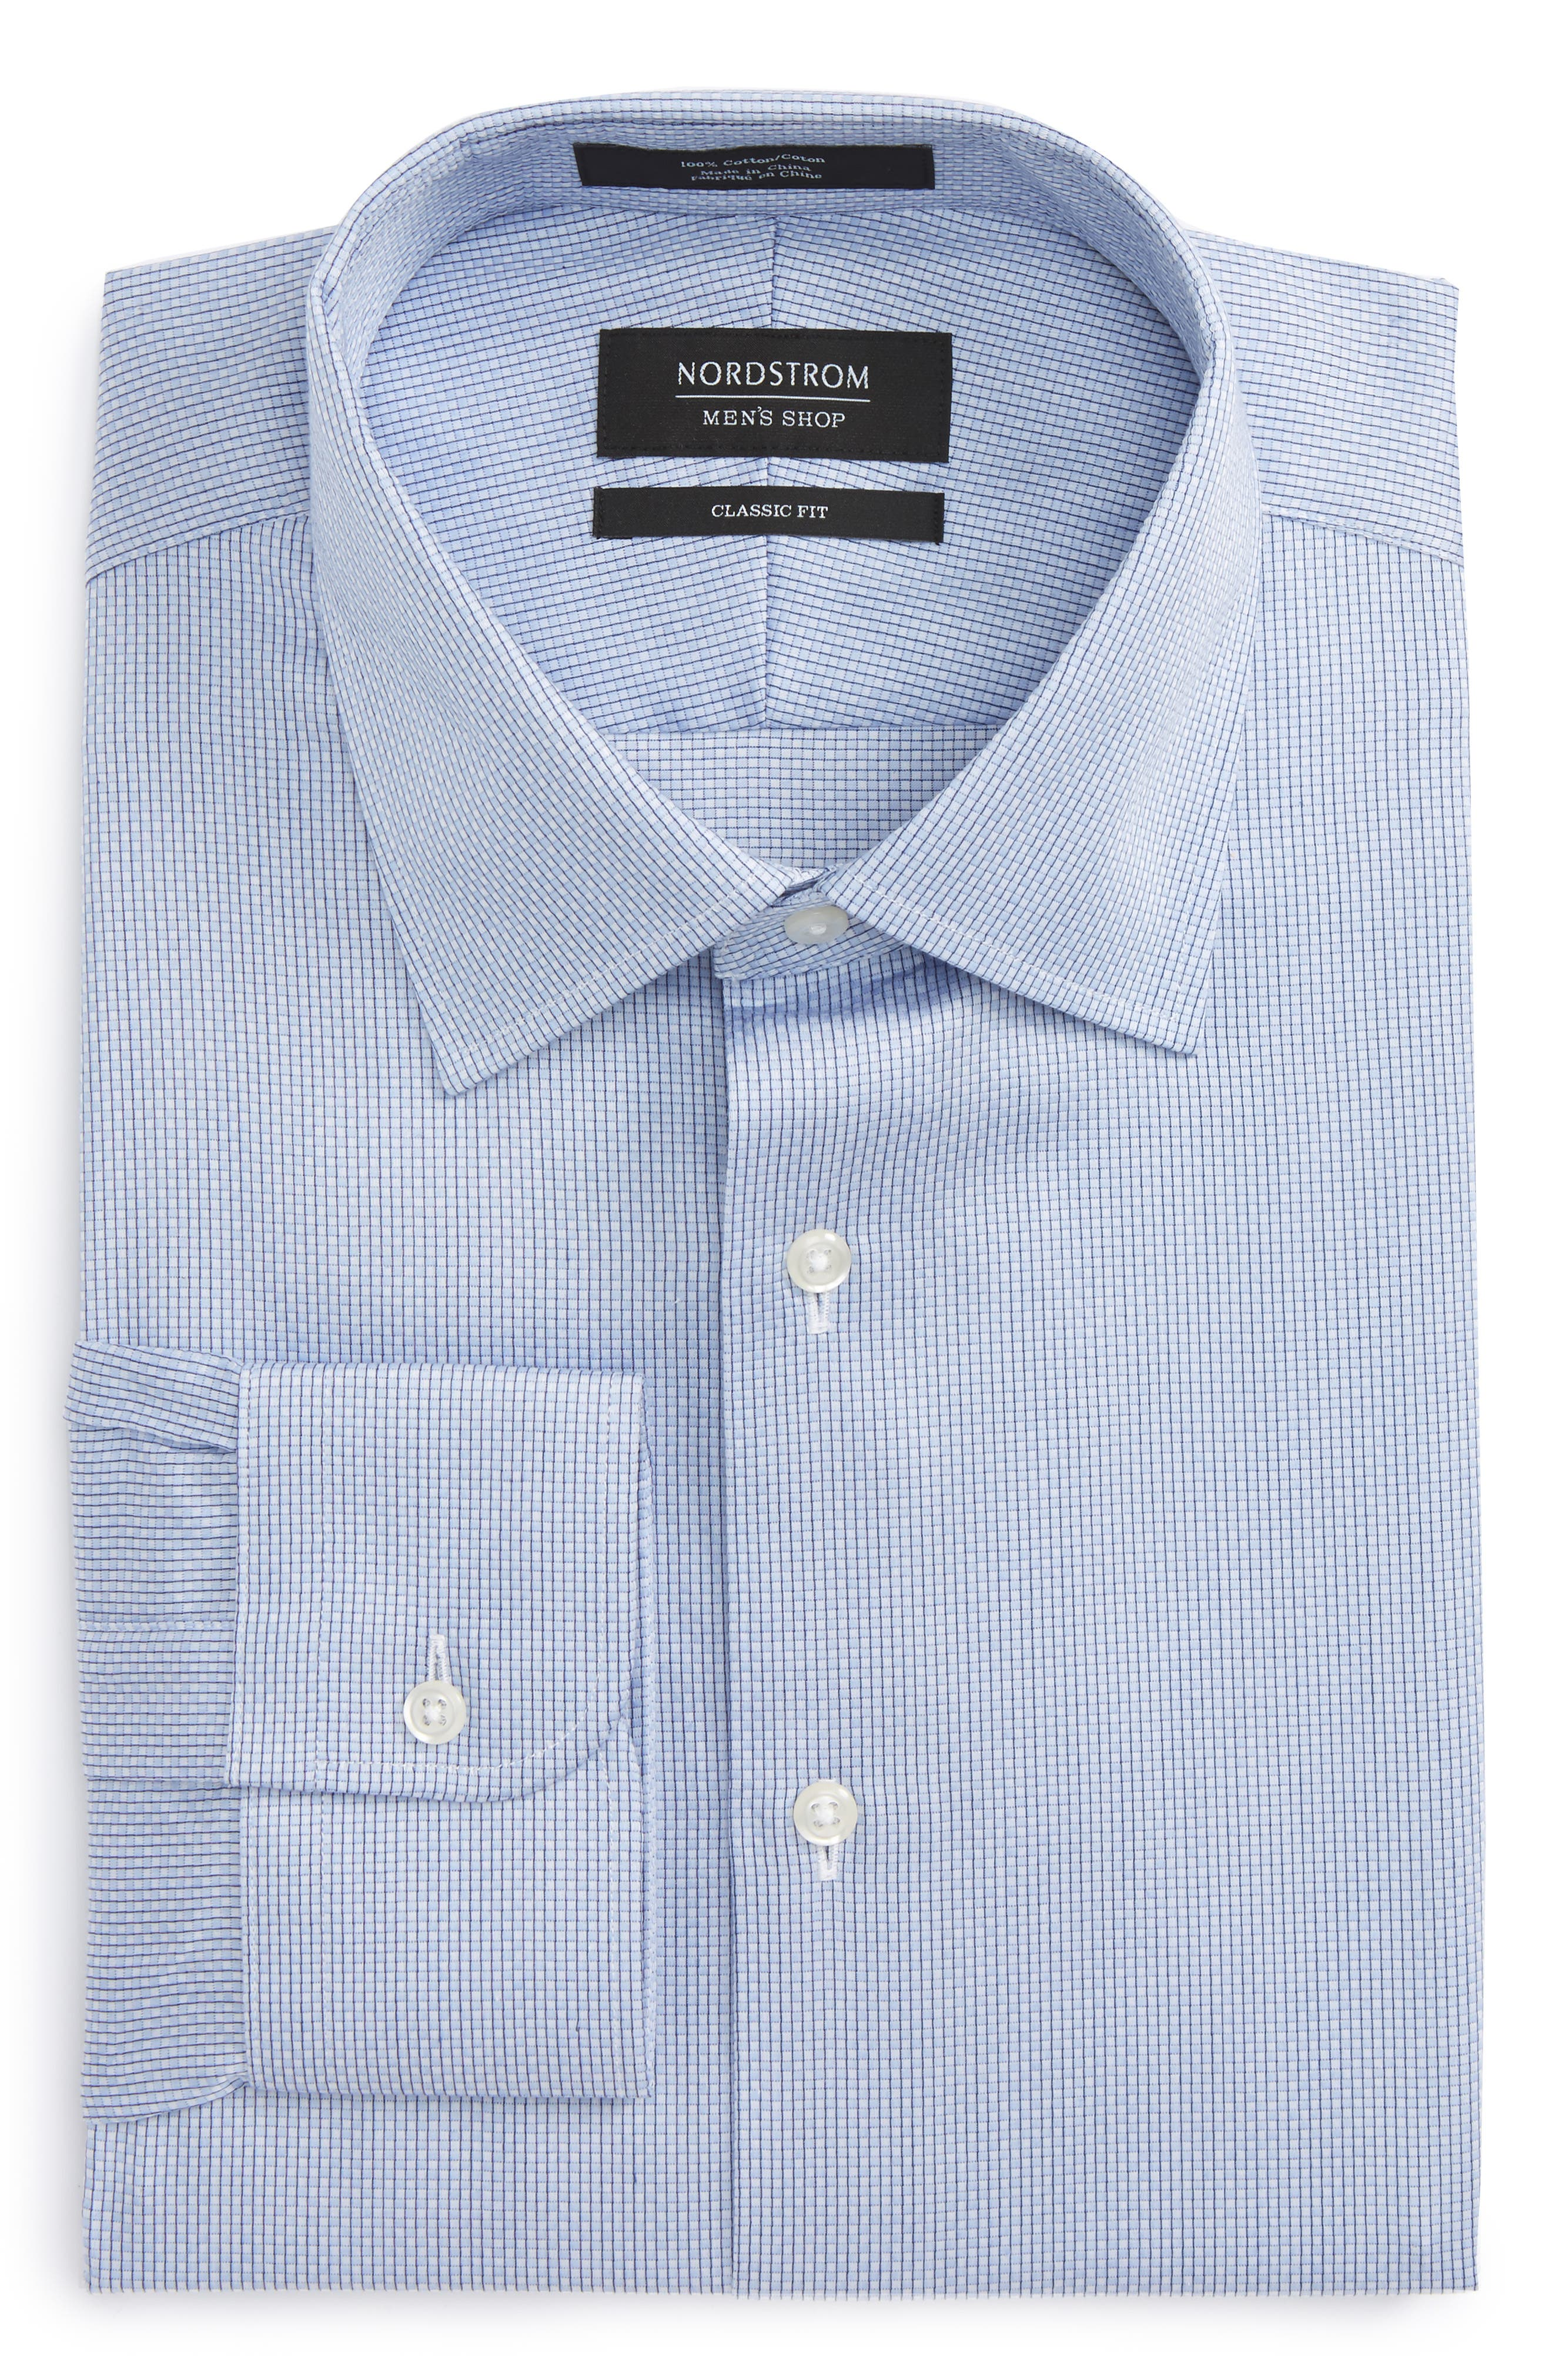 Classic Fit Check Dress Shirt,                             Main thumbnail 1, color,                             450